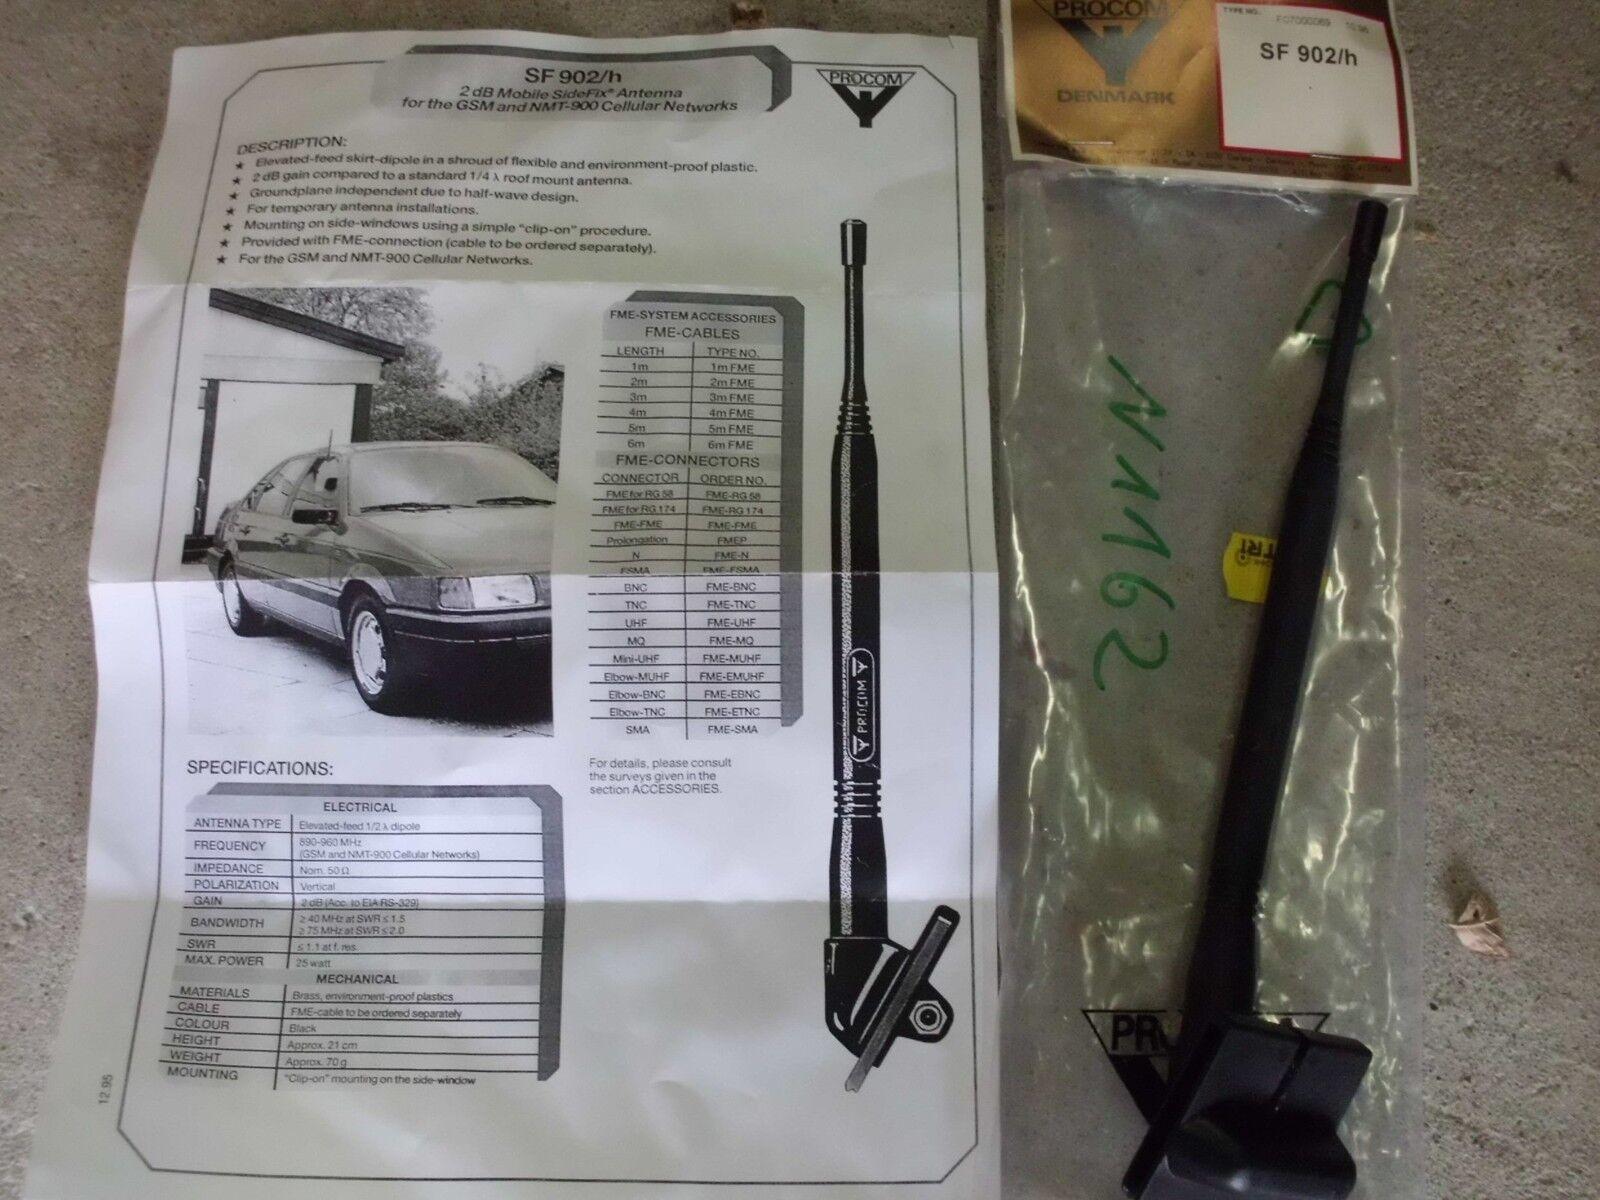 GSM Handy Antenne Scheibenantenne Procom SF 902/h 900 MHz